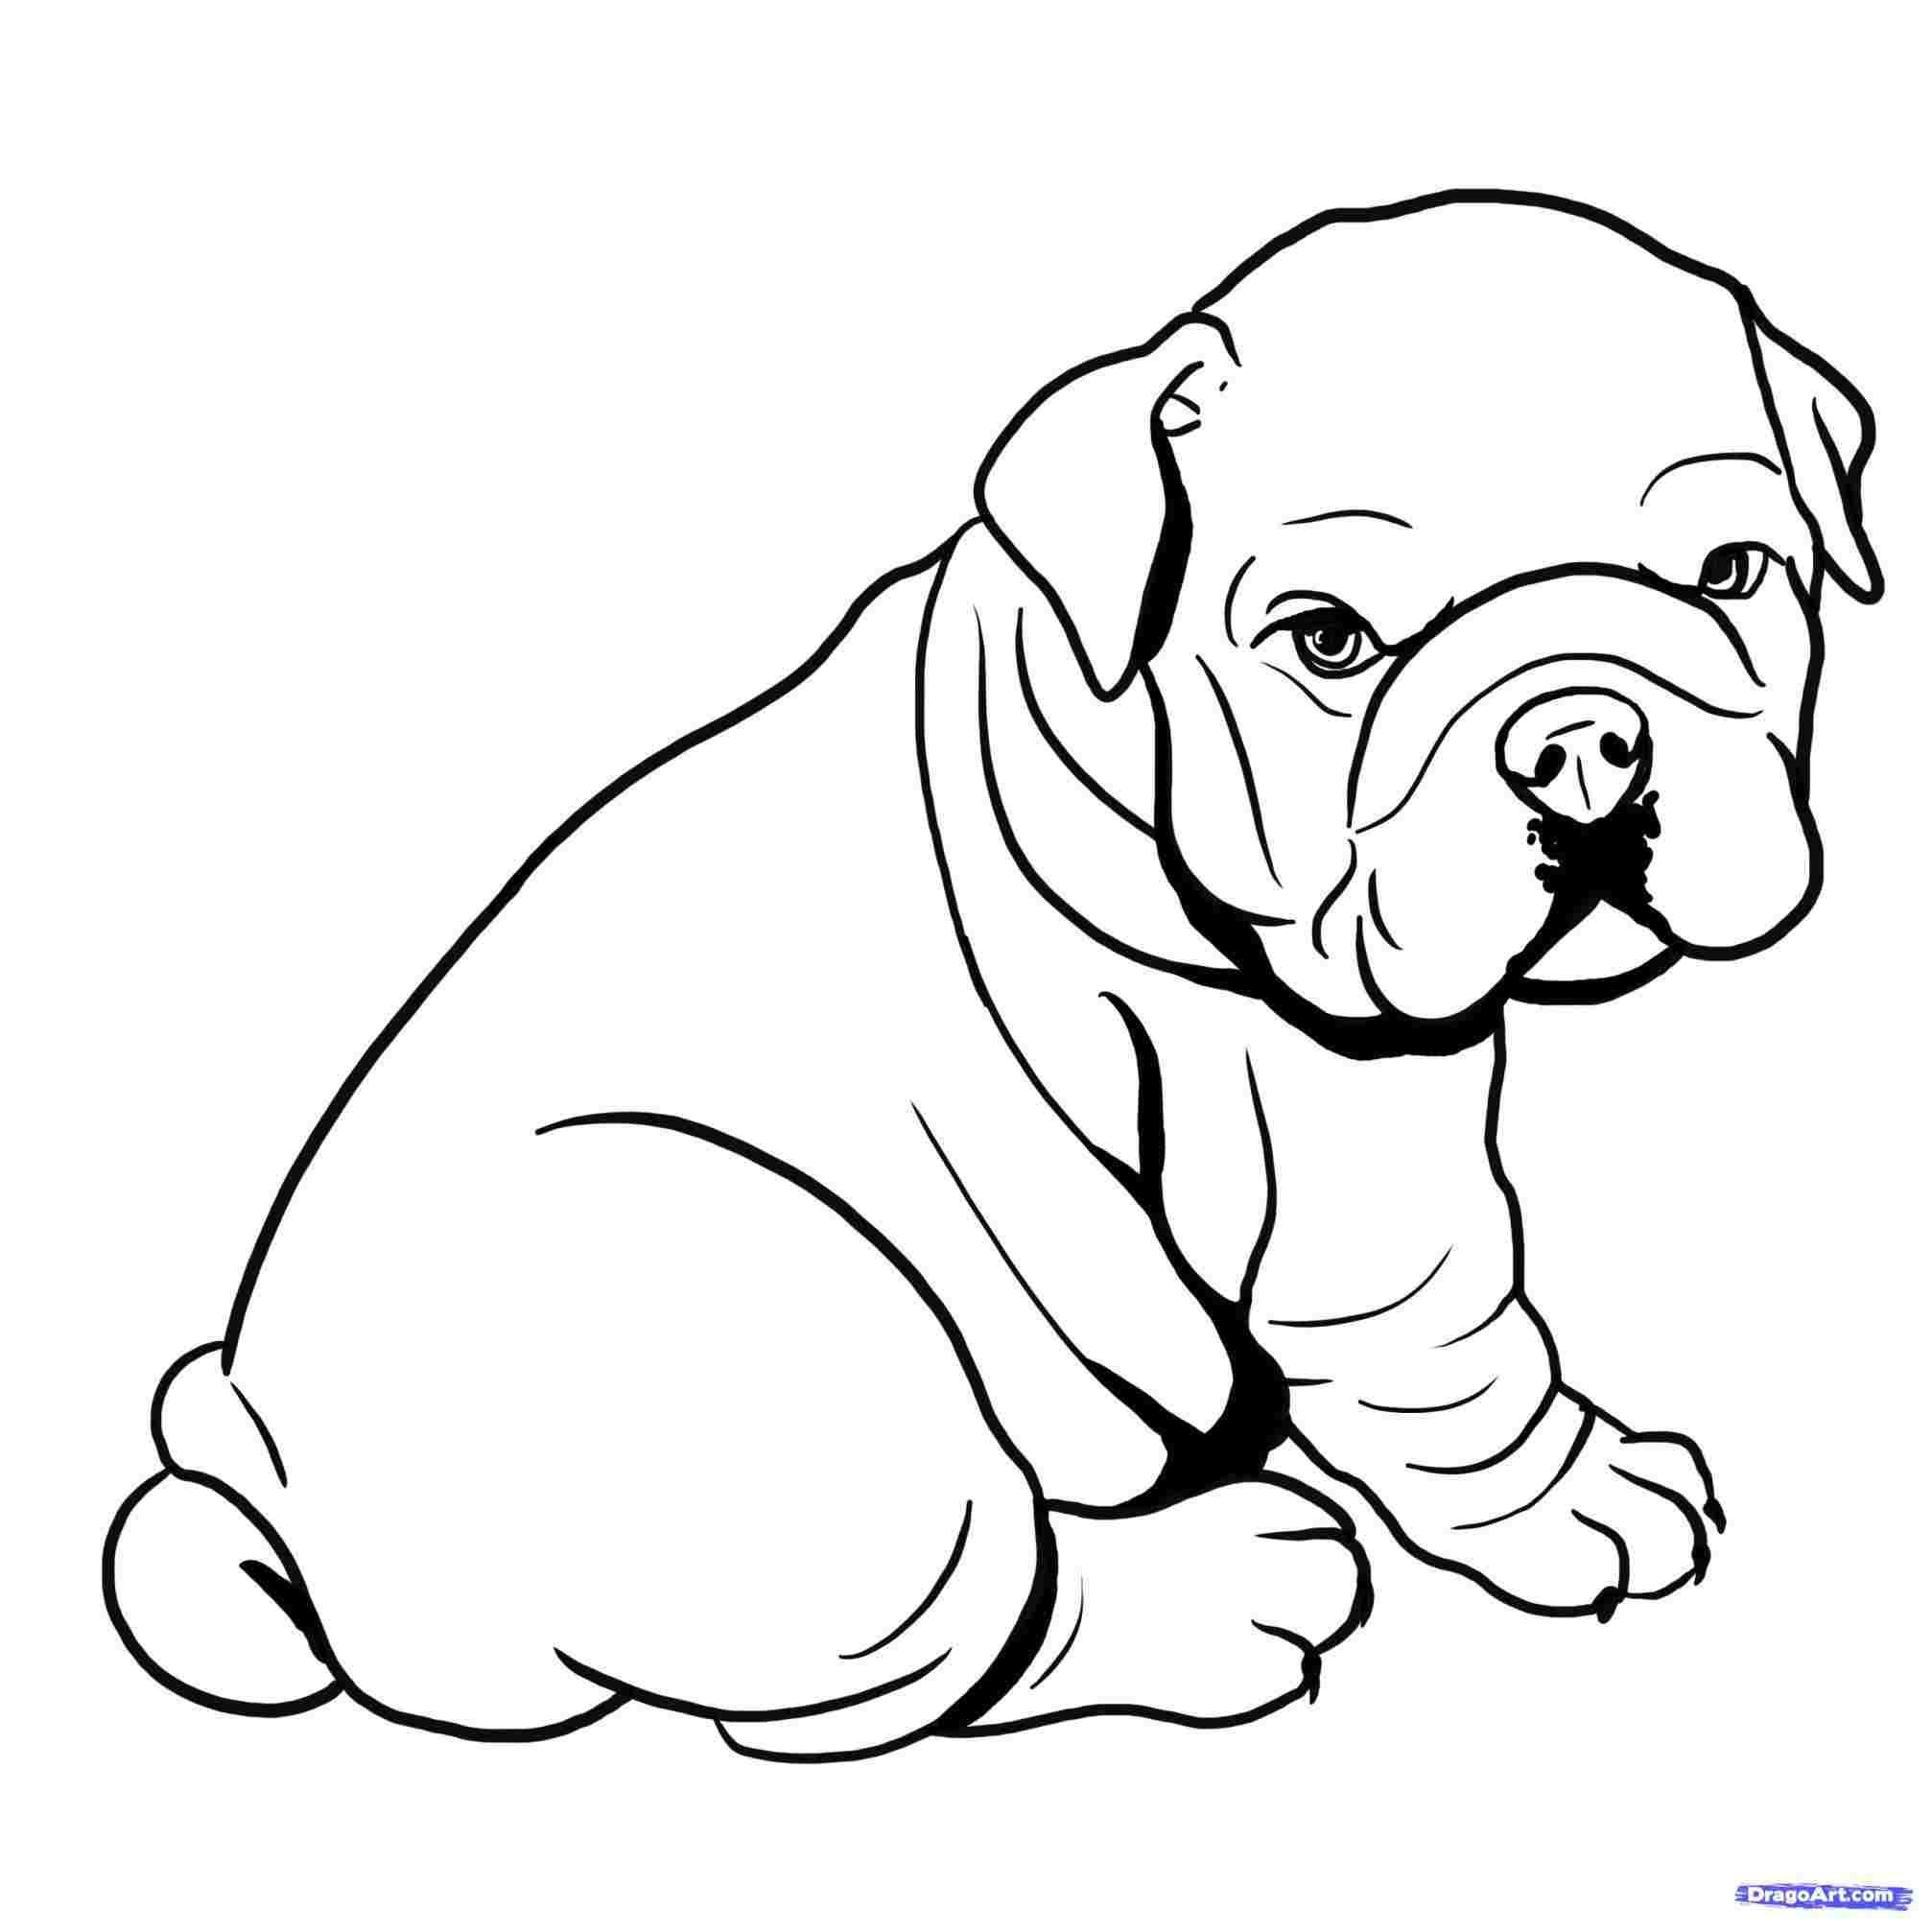 2014x2014 Pitbull Face Drawing Printable